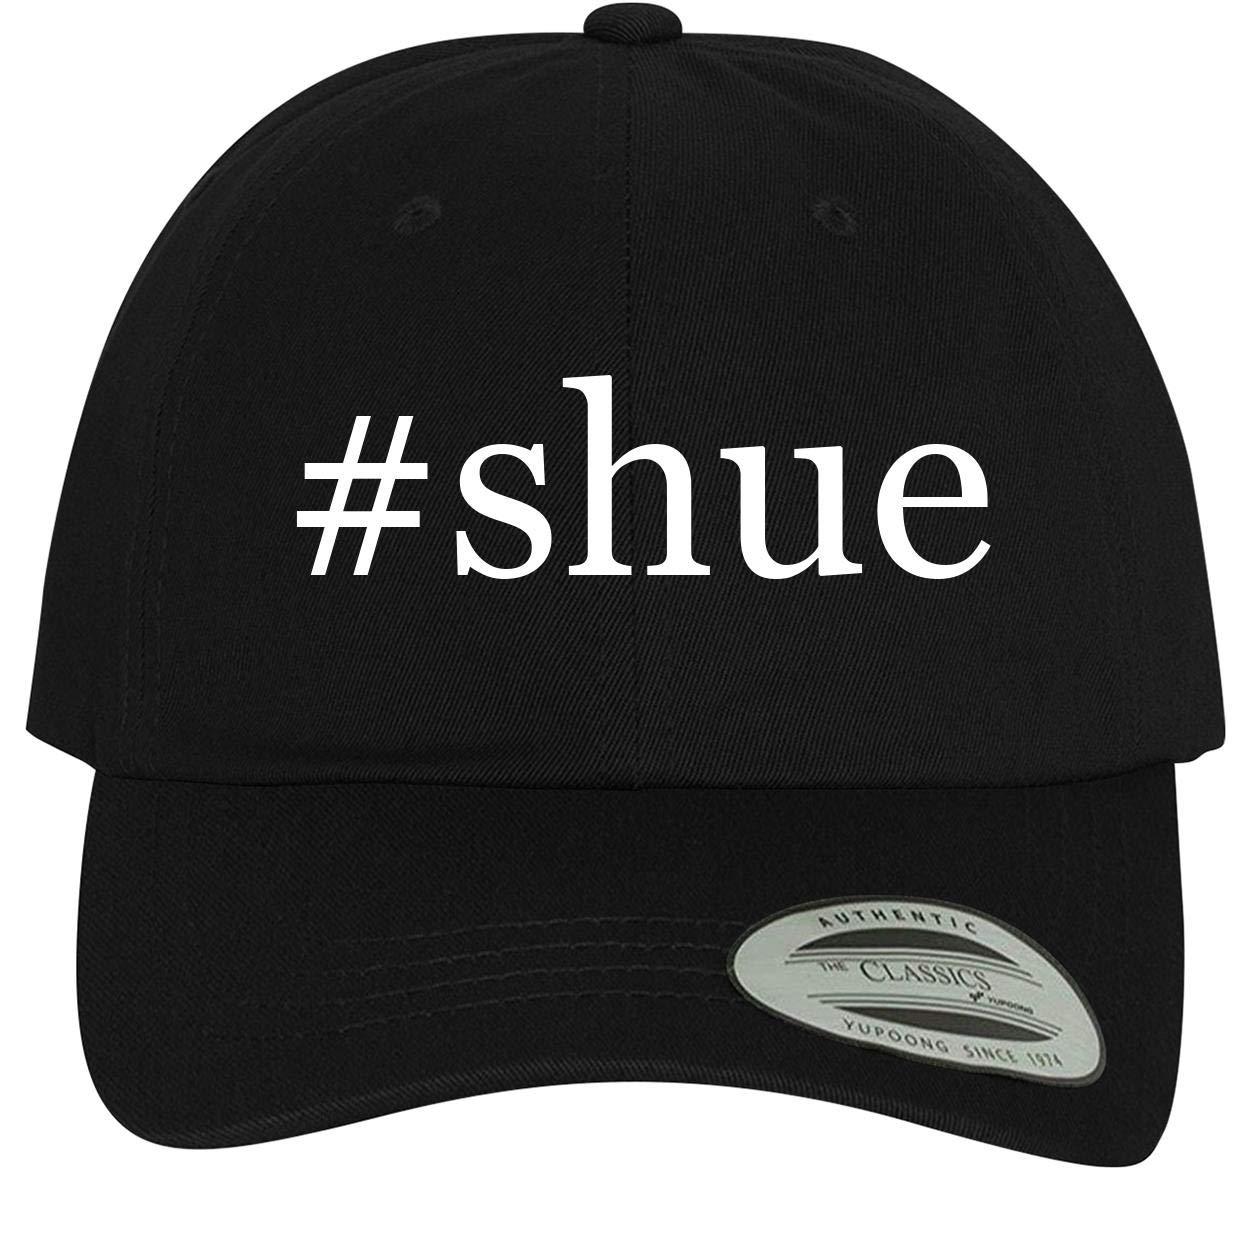 Comfortable Dad Hat Baseball Cap BH Cool Designs #Shue